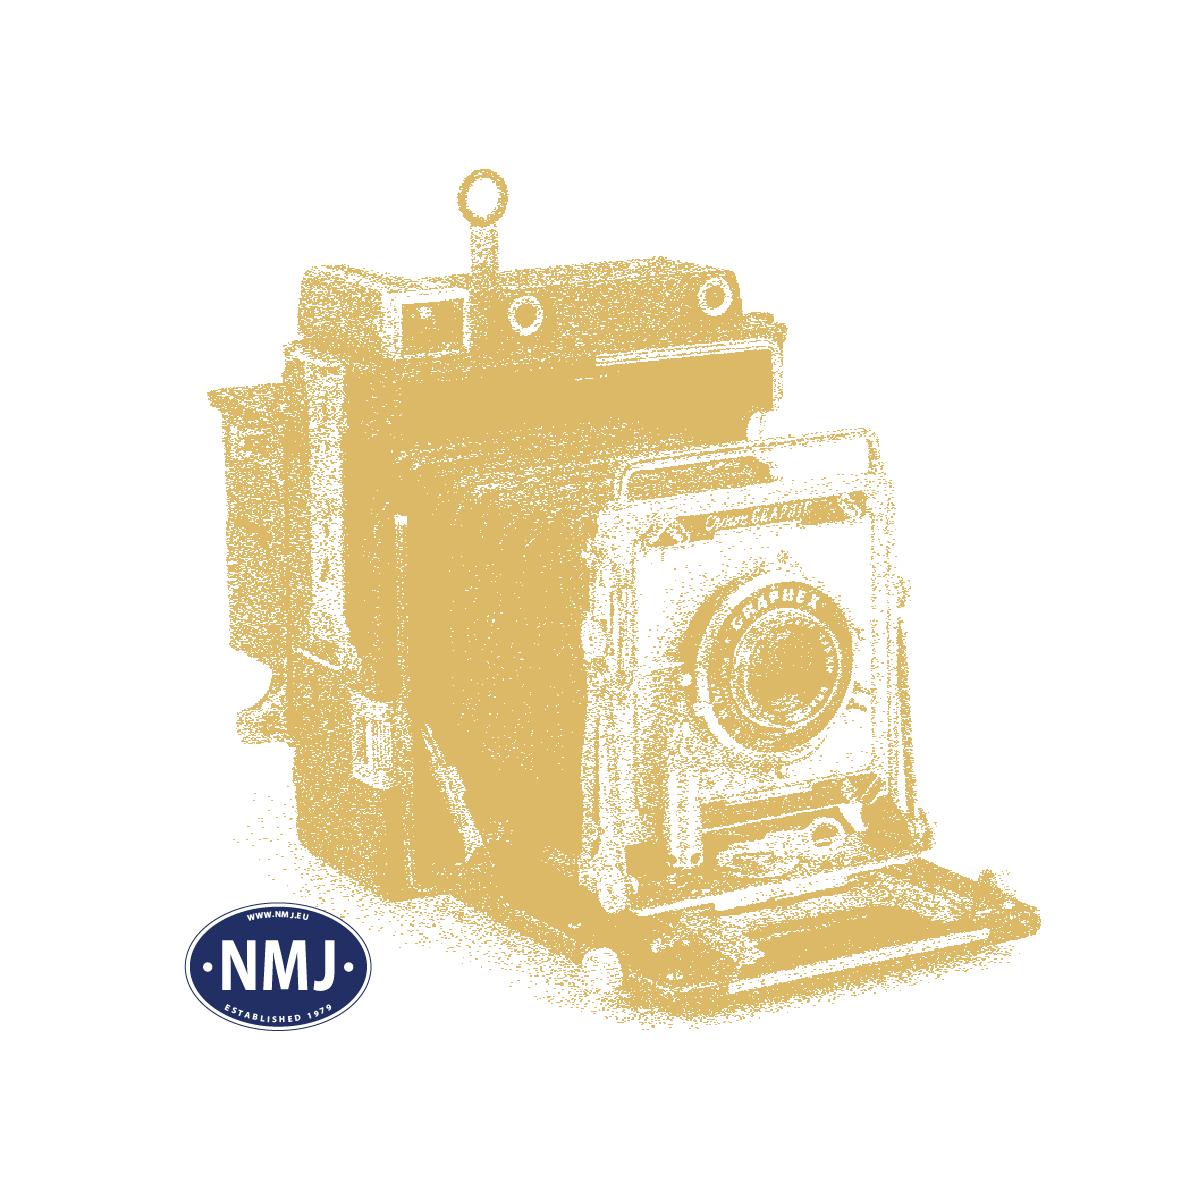 NMJT504.503 - NMJ Topline NSB His 210 2 787-9, type 5